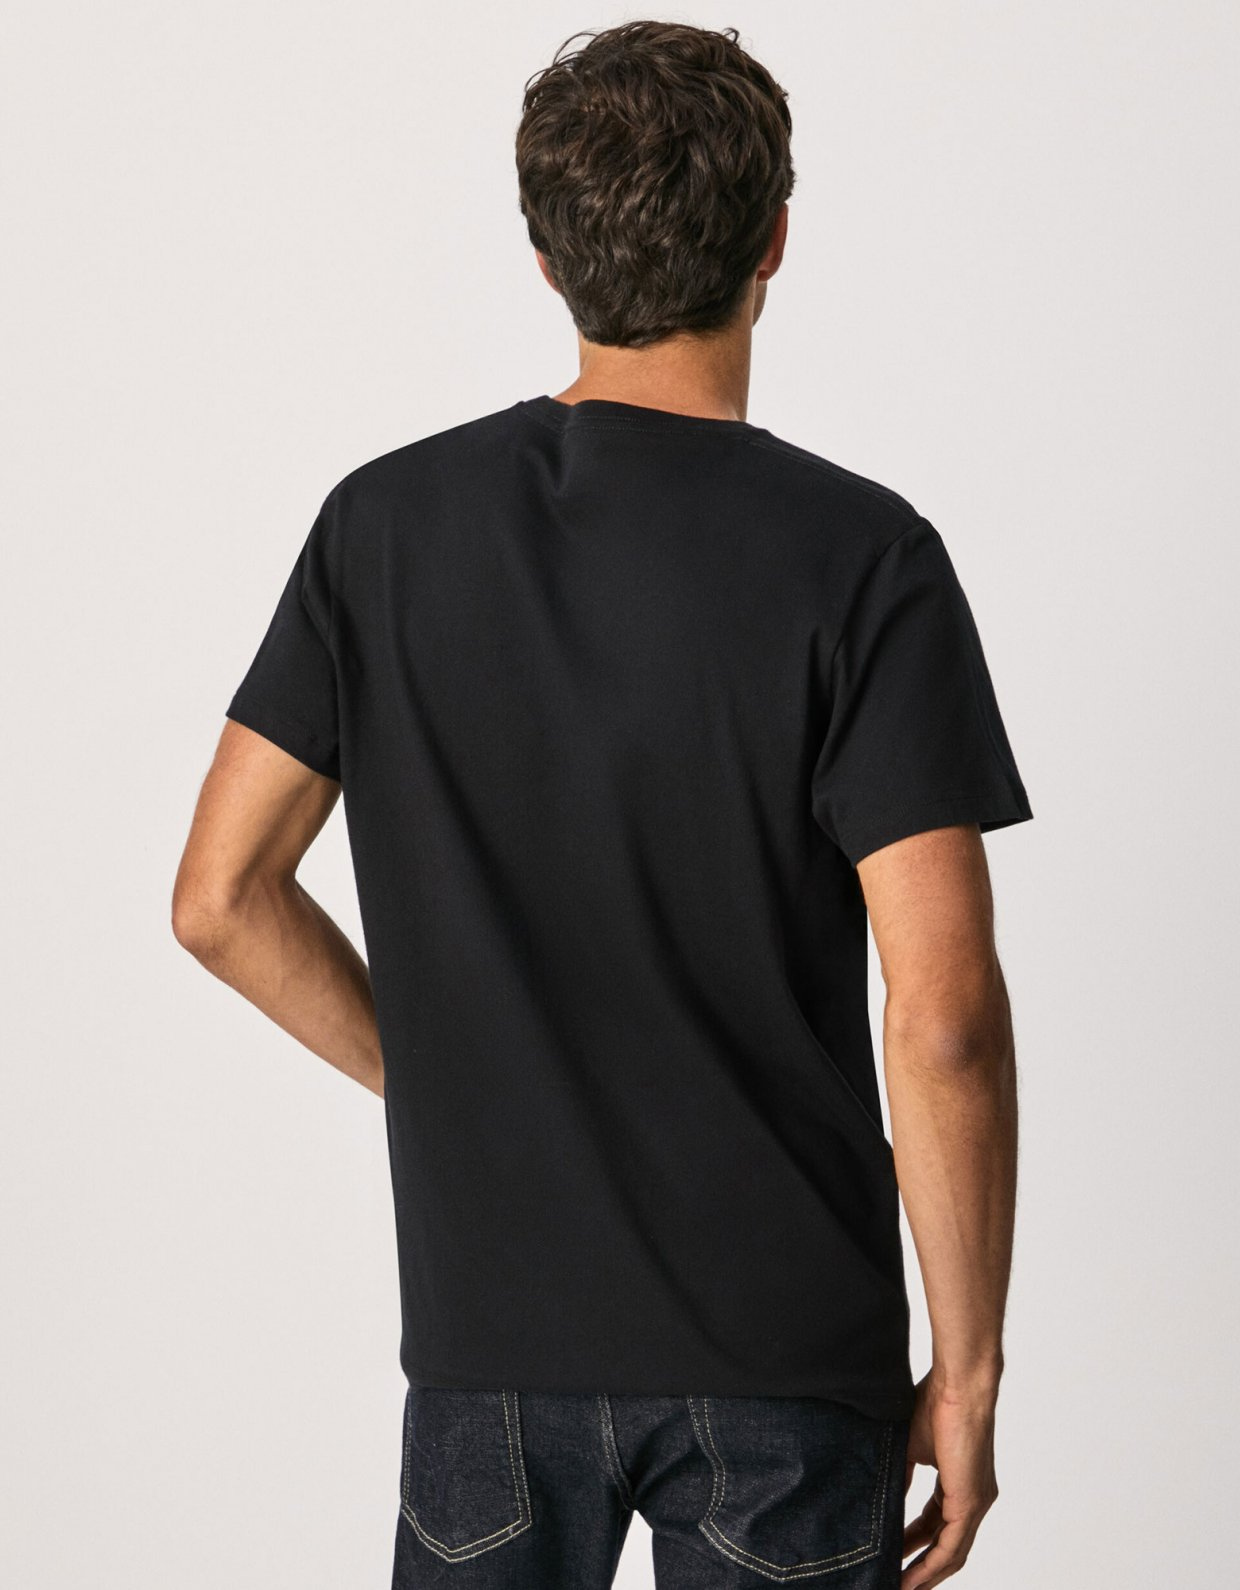 Pepe Jeans Eggo basic t-shirt black